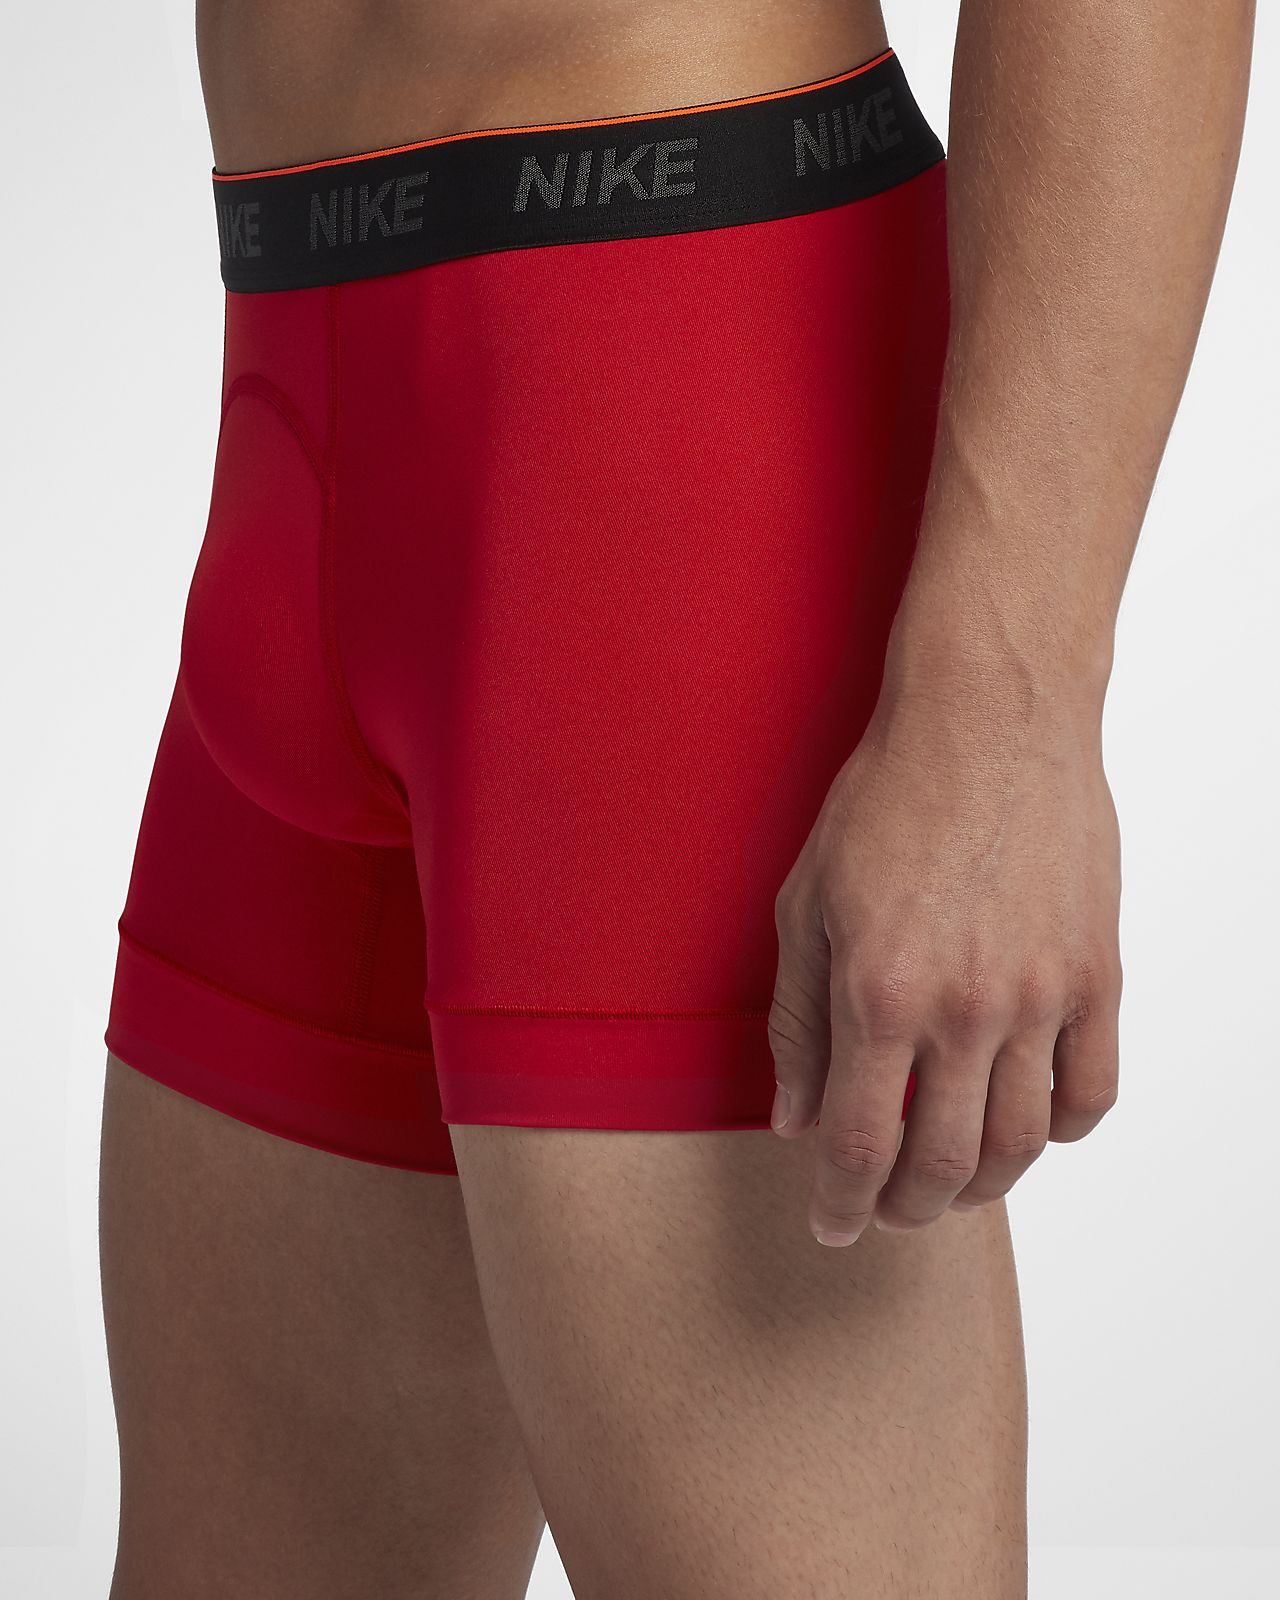 25f304a1e Nike Men s Underwear (2 Pairs). Nike.com